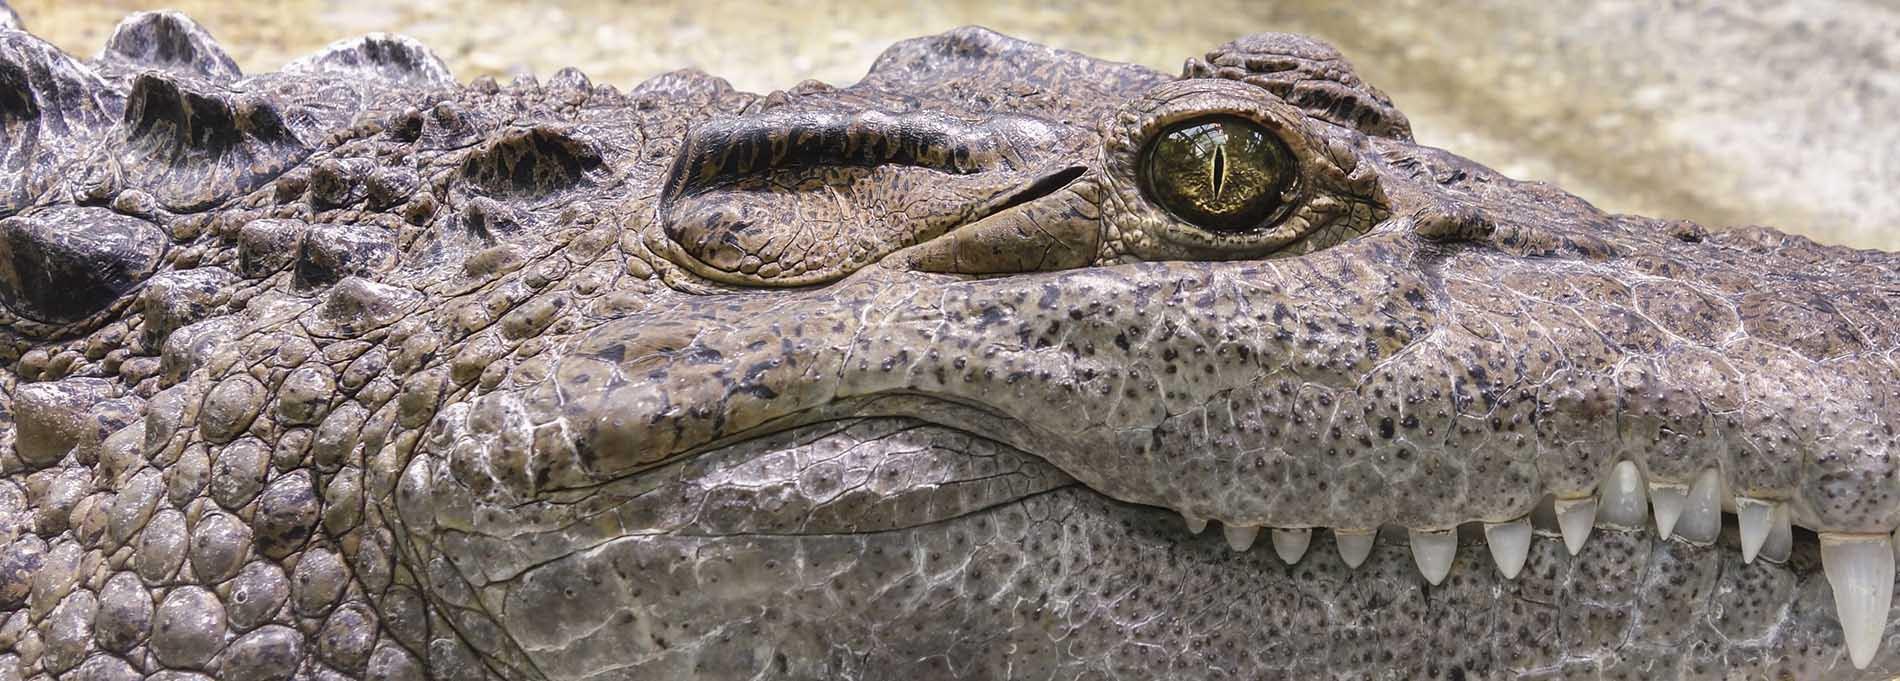 crocodile1900.jpg